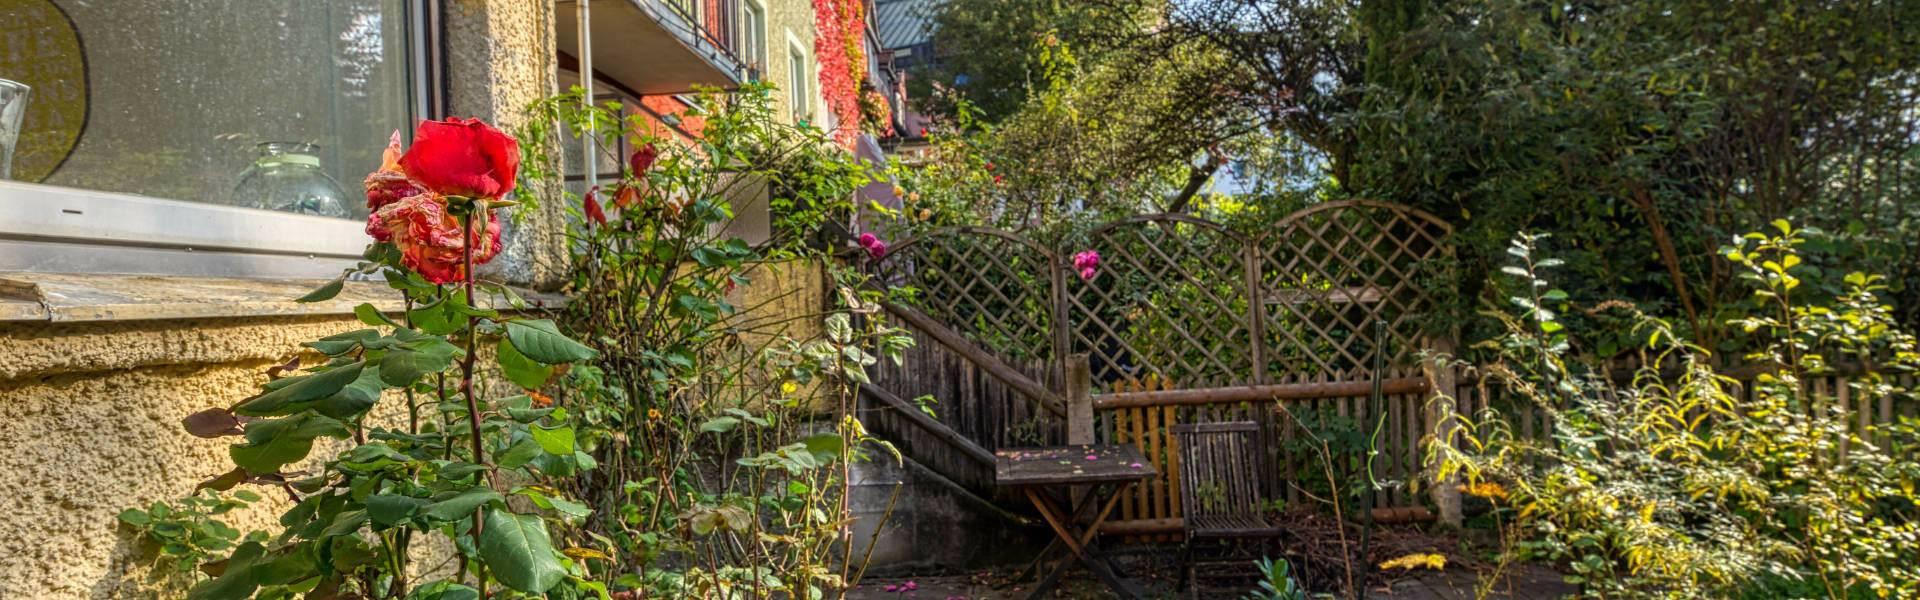 Obersendling Wohnung Garten